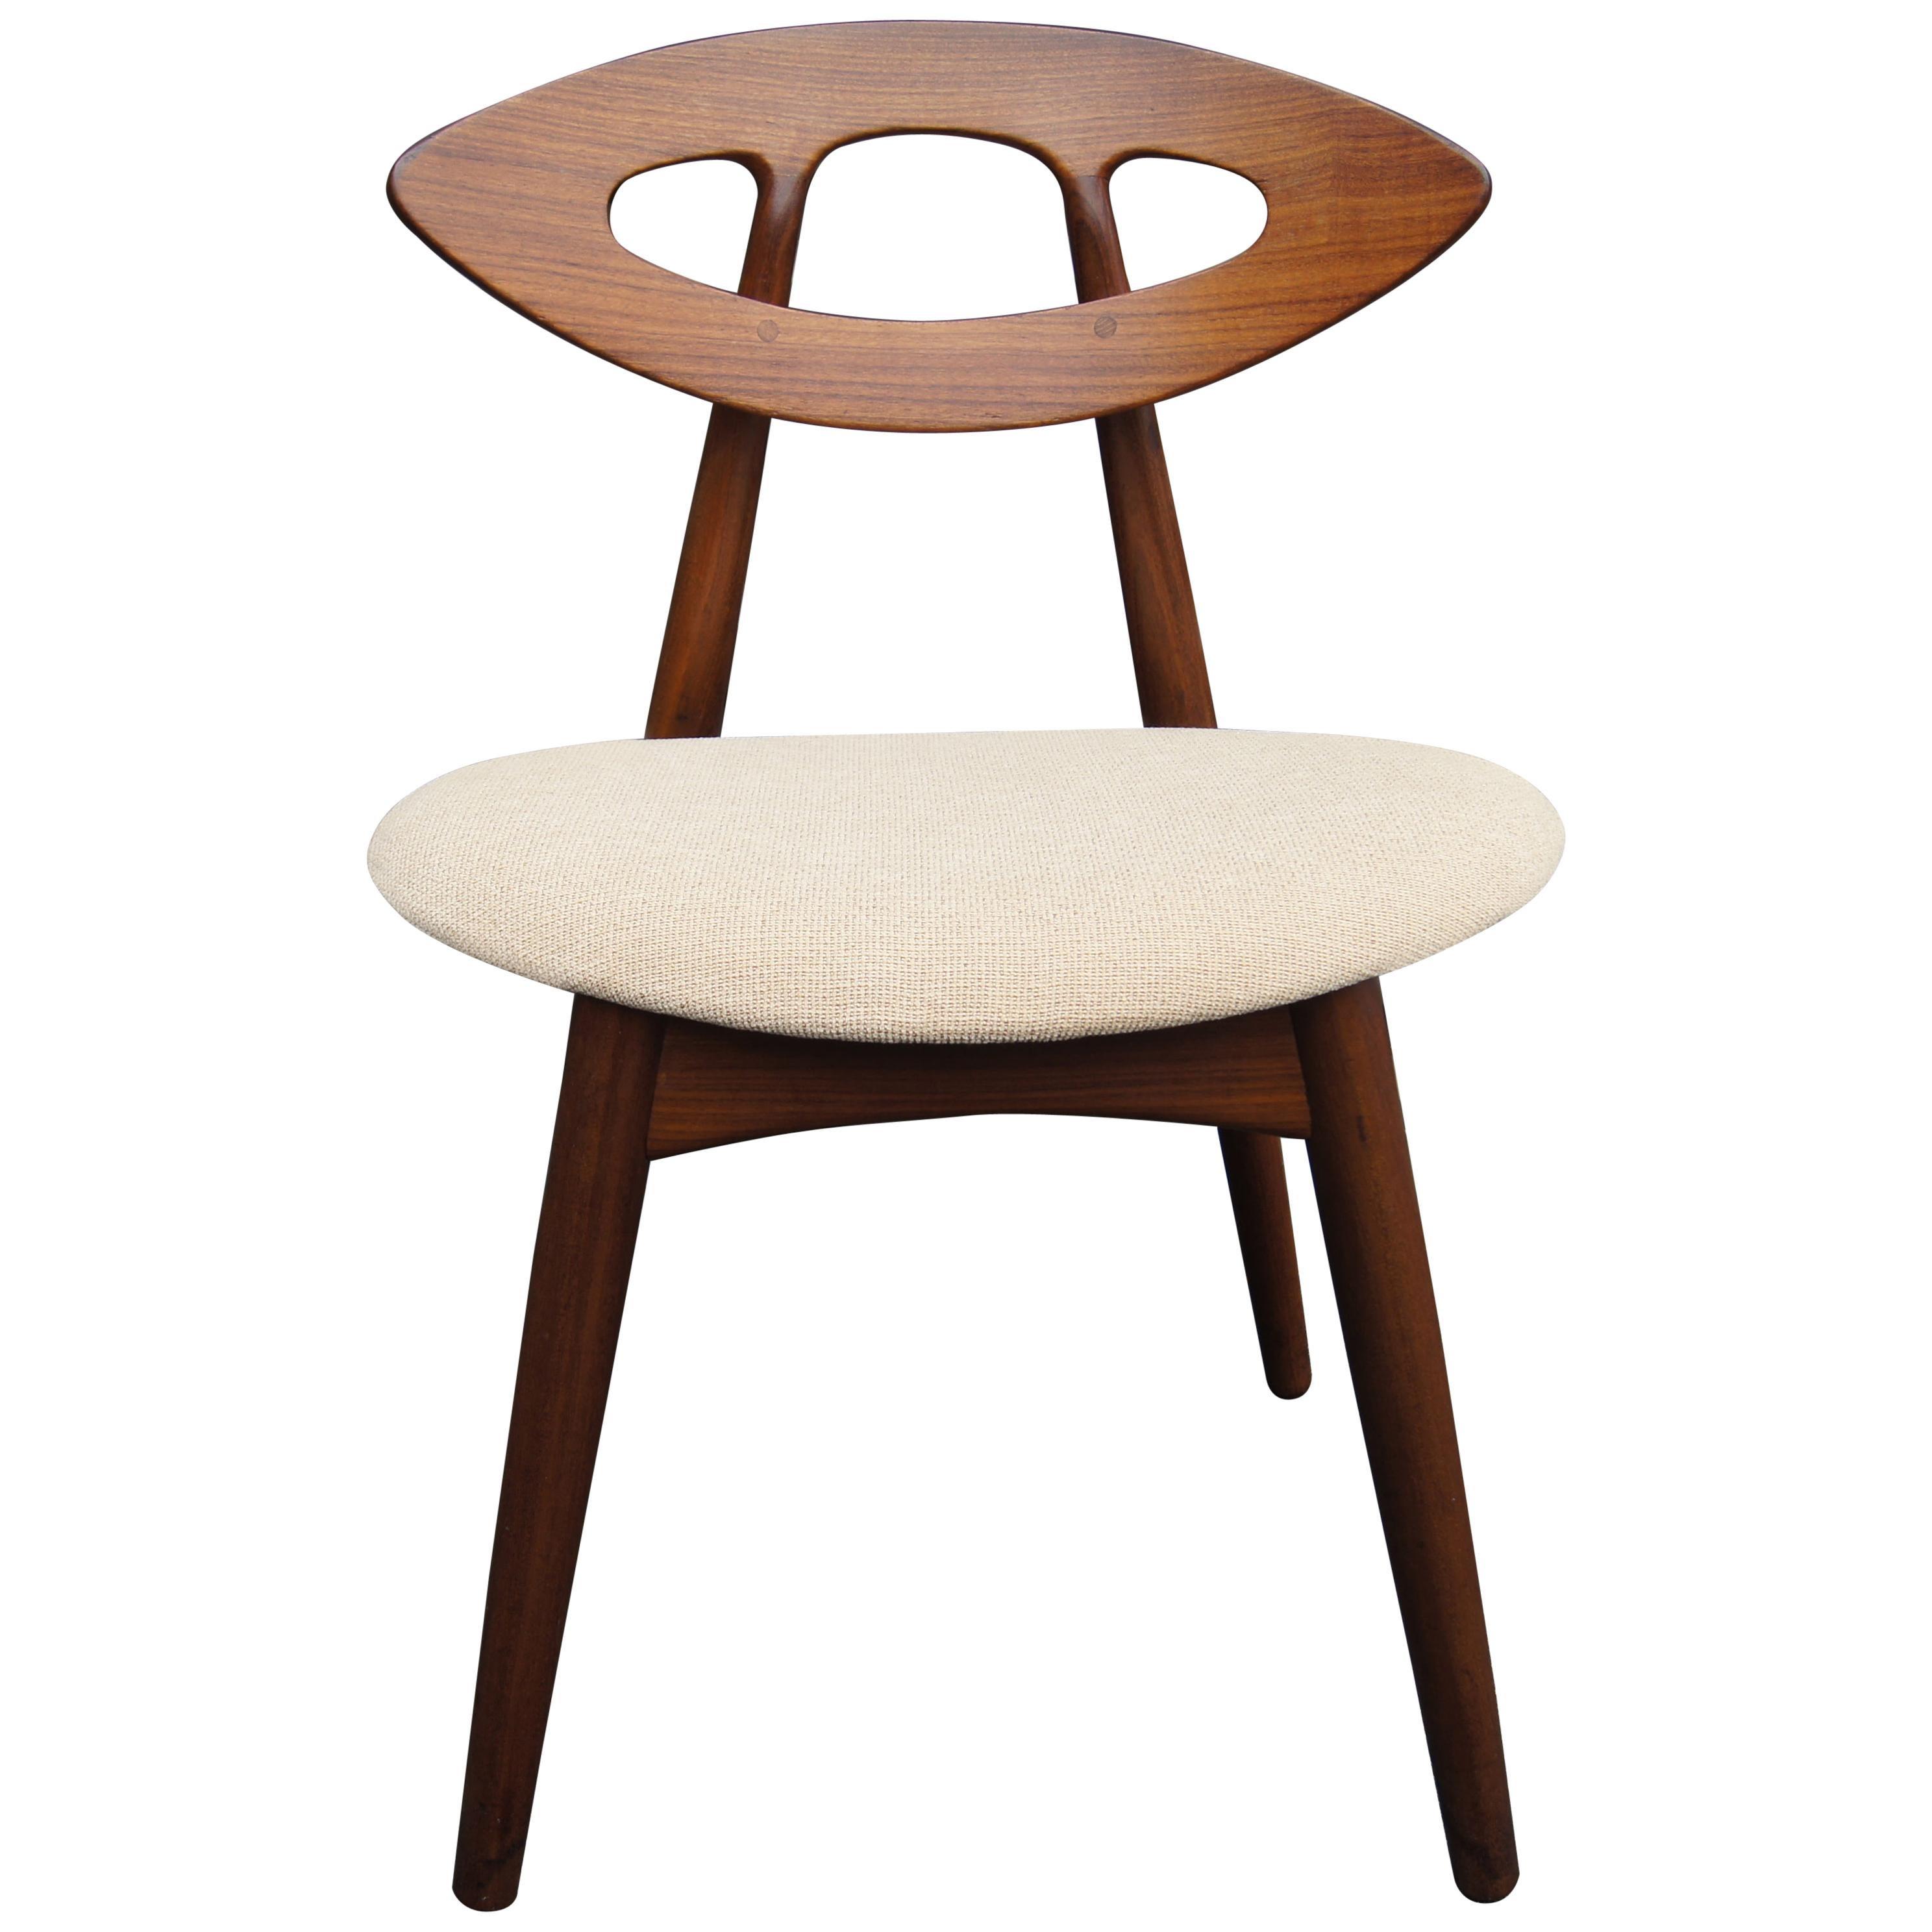 Set of Four Teak Eye Chairs by Ejvind A. Johansson for Ivan Gern Møbelfabrik